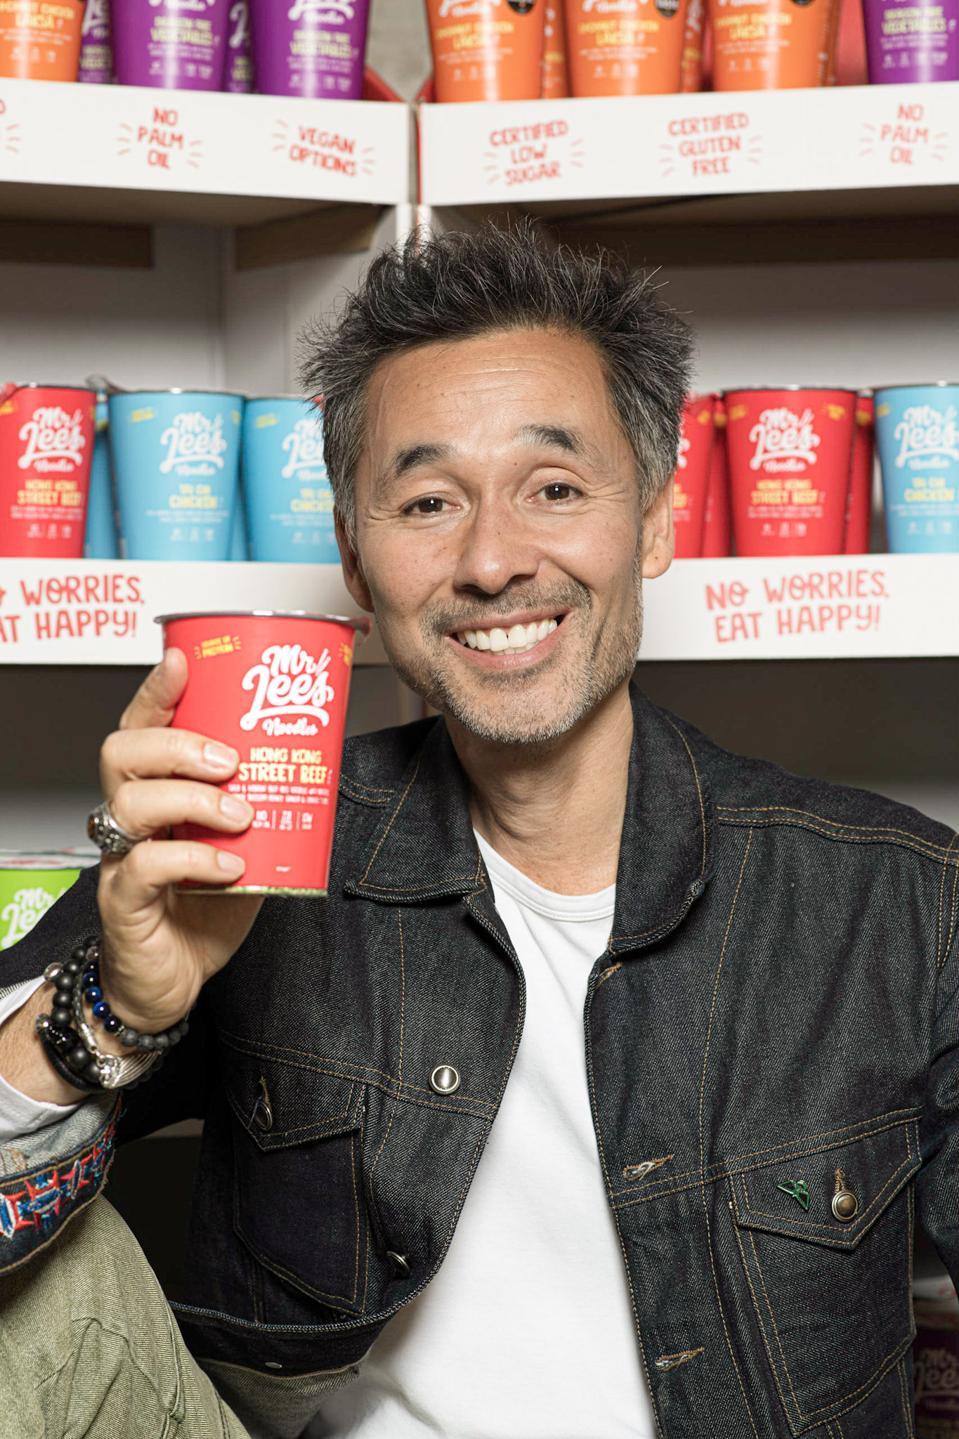 Damien Lee, co-founder of Mr. Lees Noodles, holding a cup of instant noodles